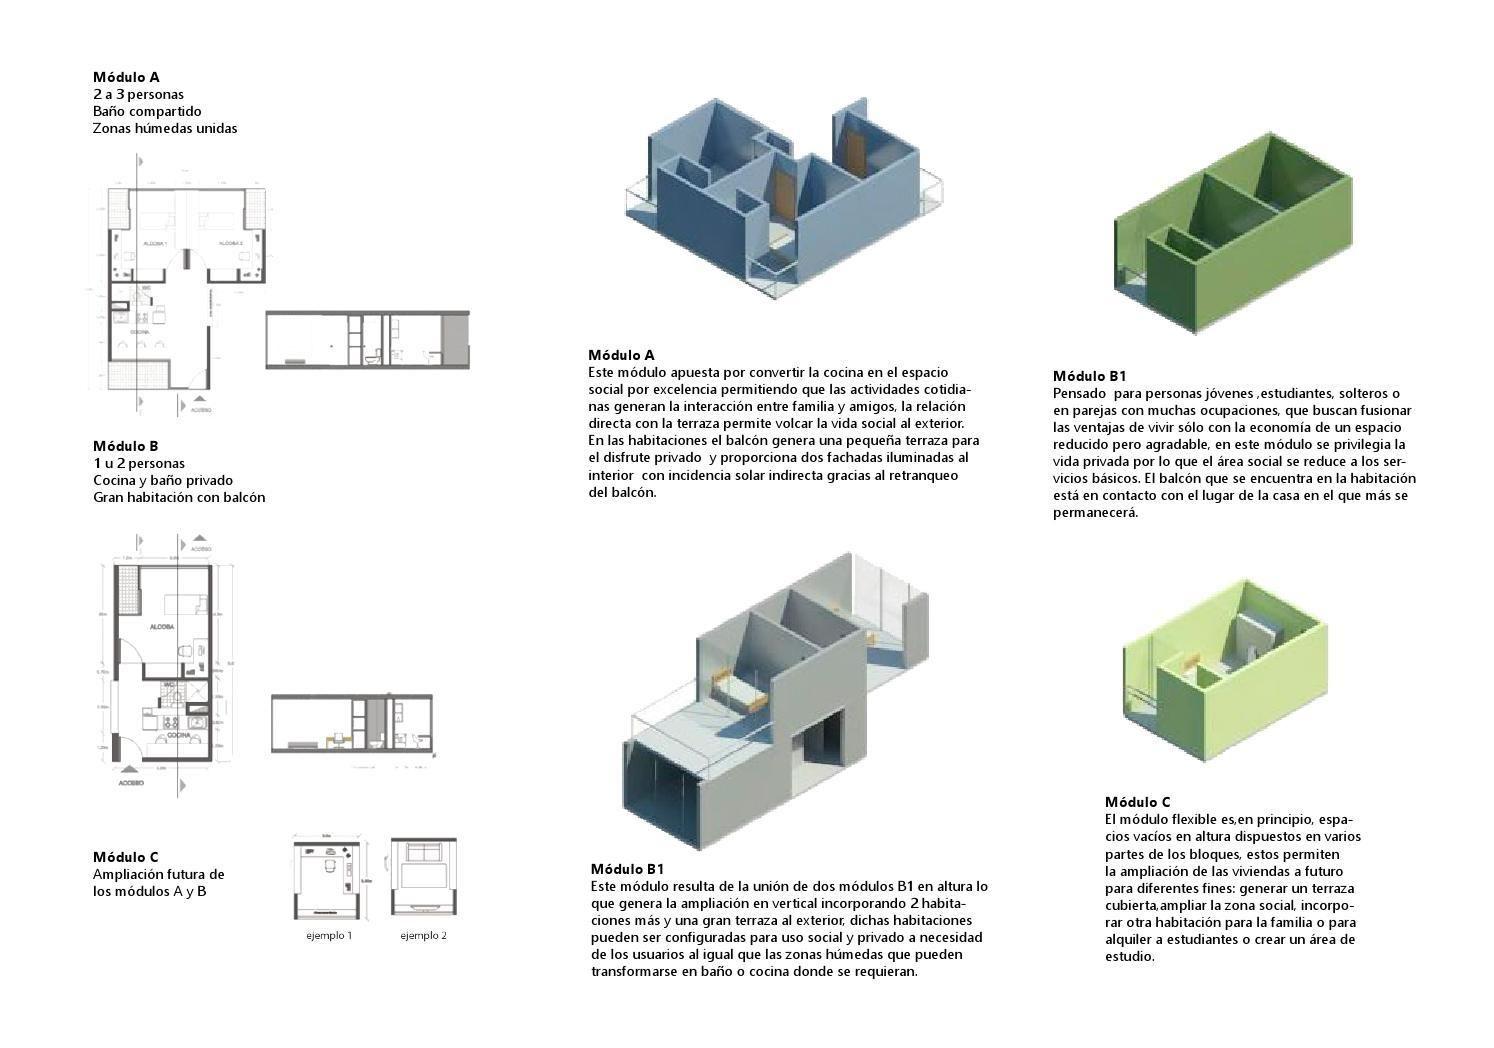 Portafolio De Proyectos Projects Illustrations Posters